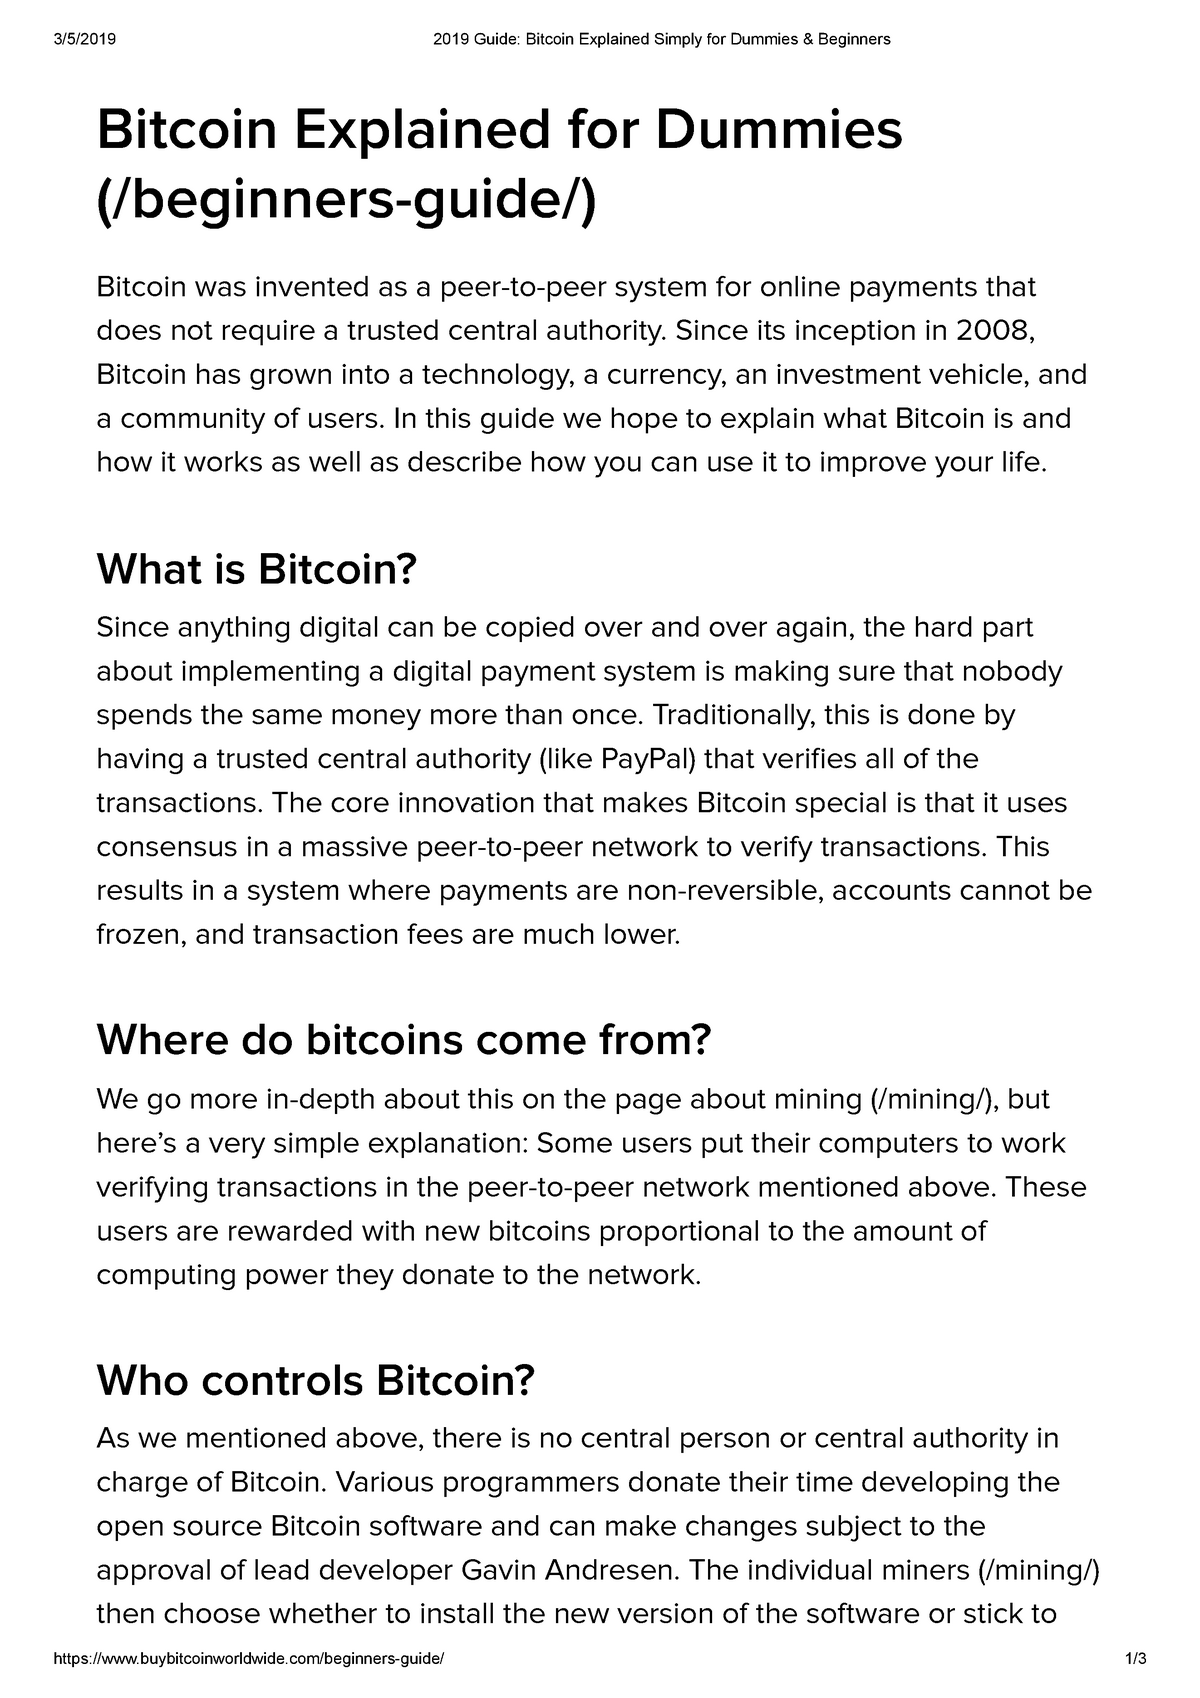 bitcoins for dummies explained sum